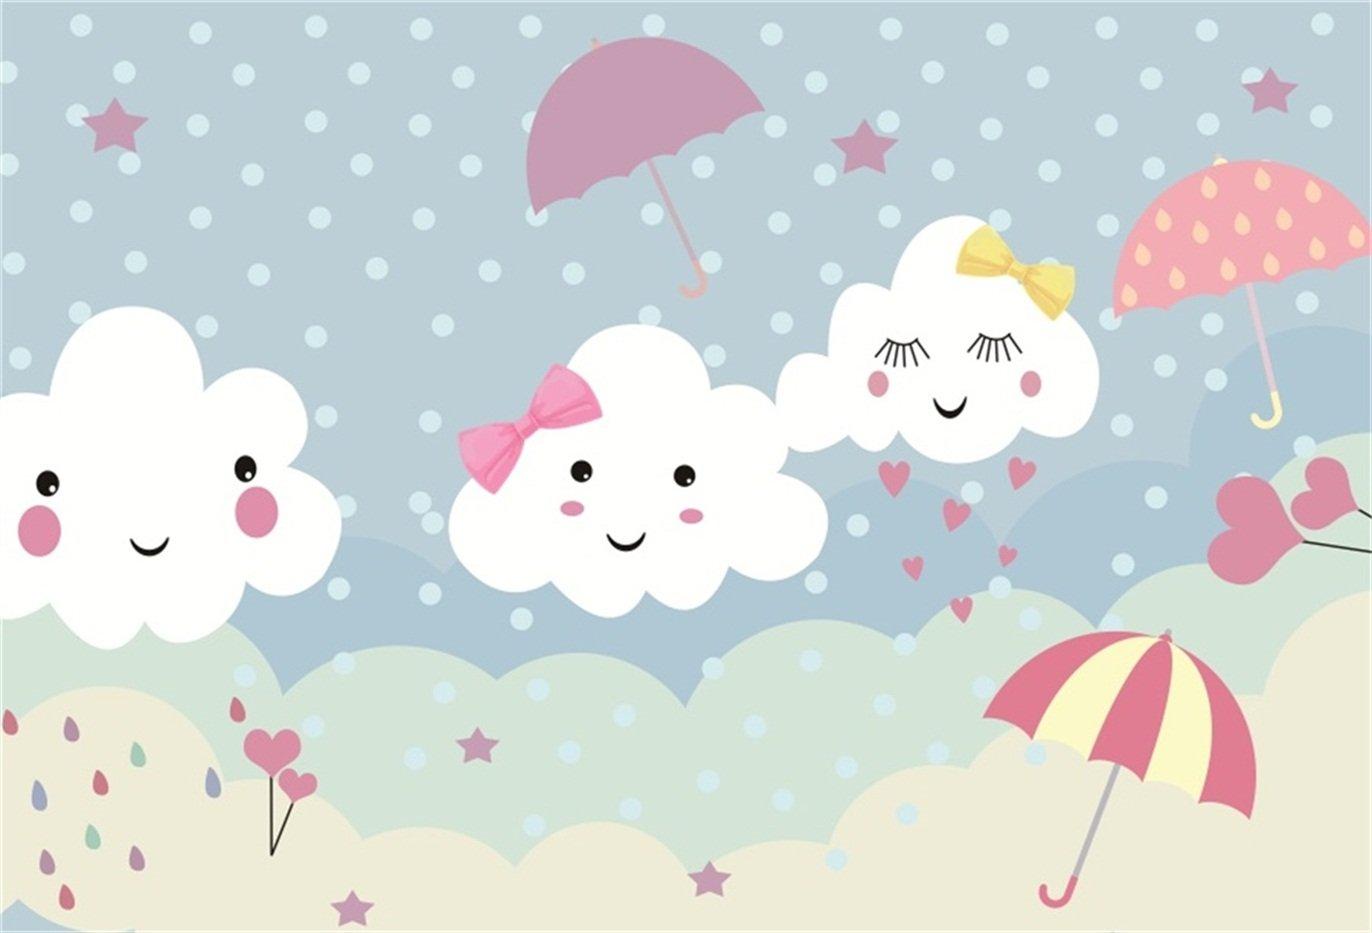 csfoto 7 x 5ft Smiling Sleeping Shyness Clouds背景漫画かわいい傘雪写真バックドロップベビーシャワーStudio propskid幼児新生児ベビーArtistic Portrait壁紙   B07F5K91Y4